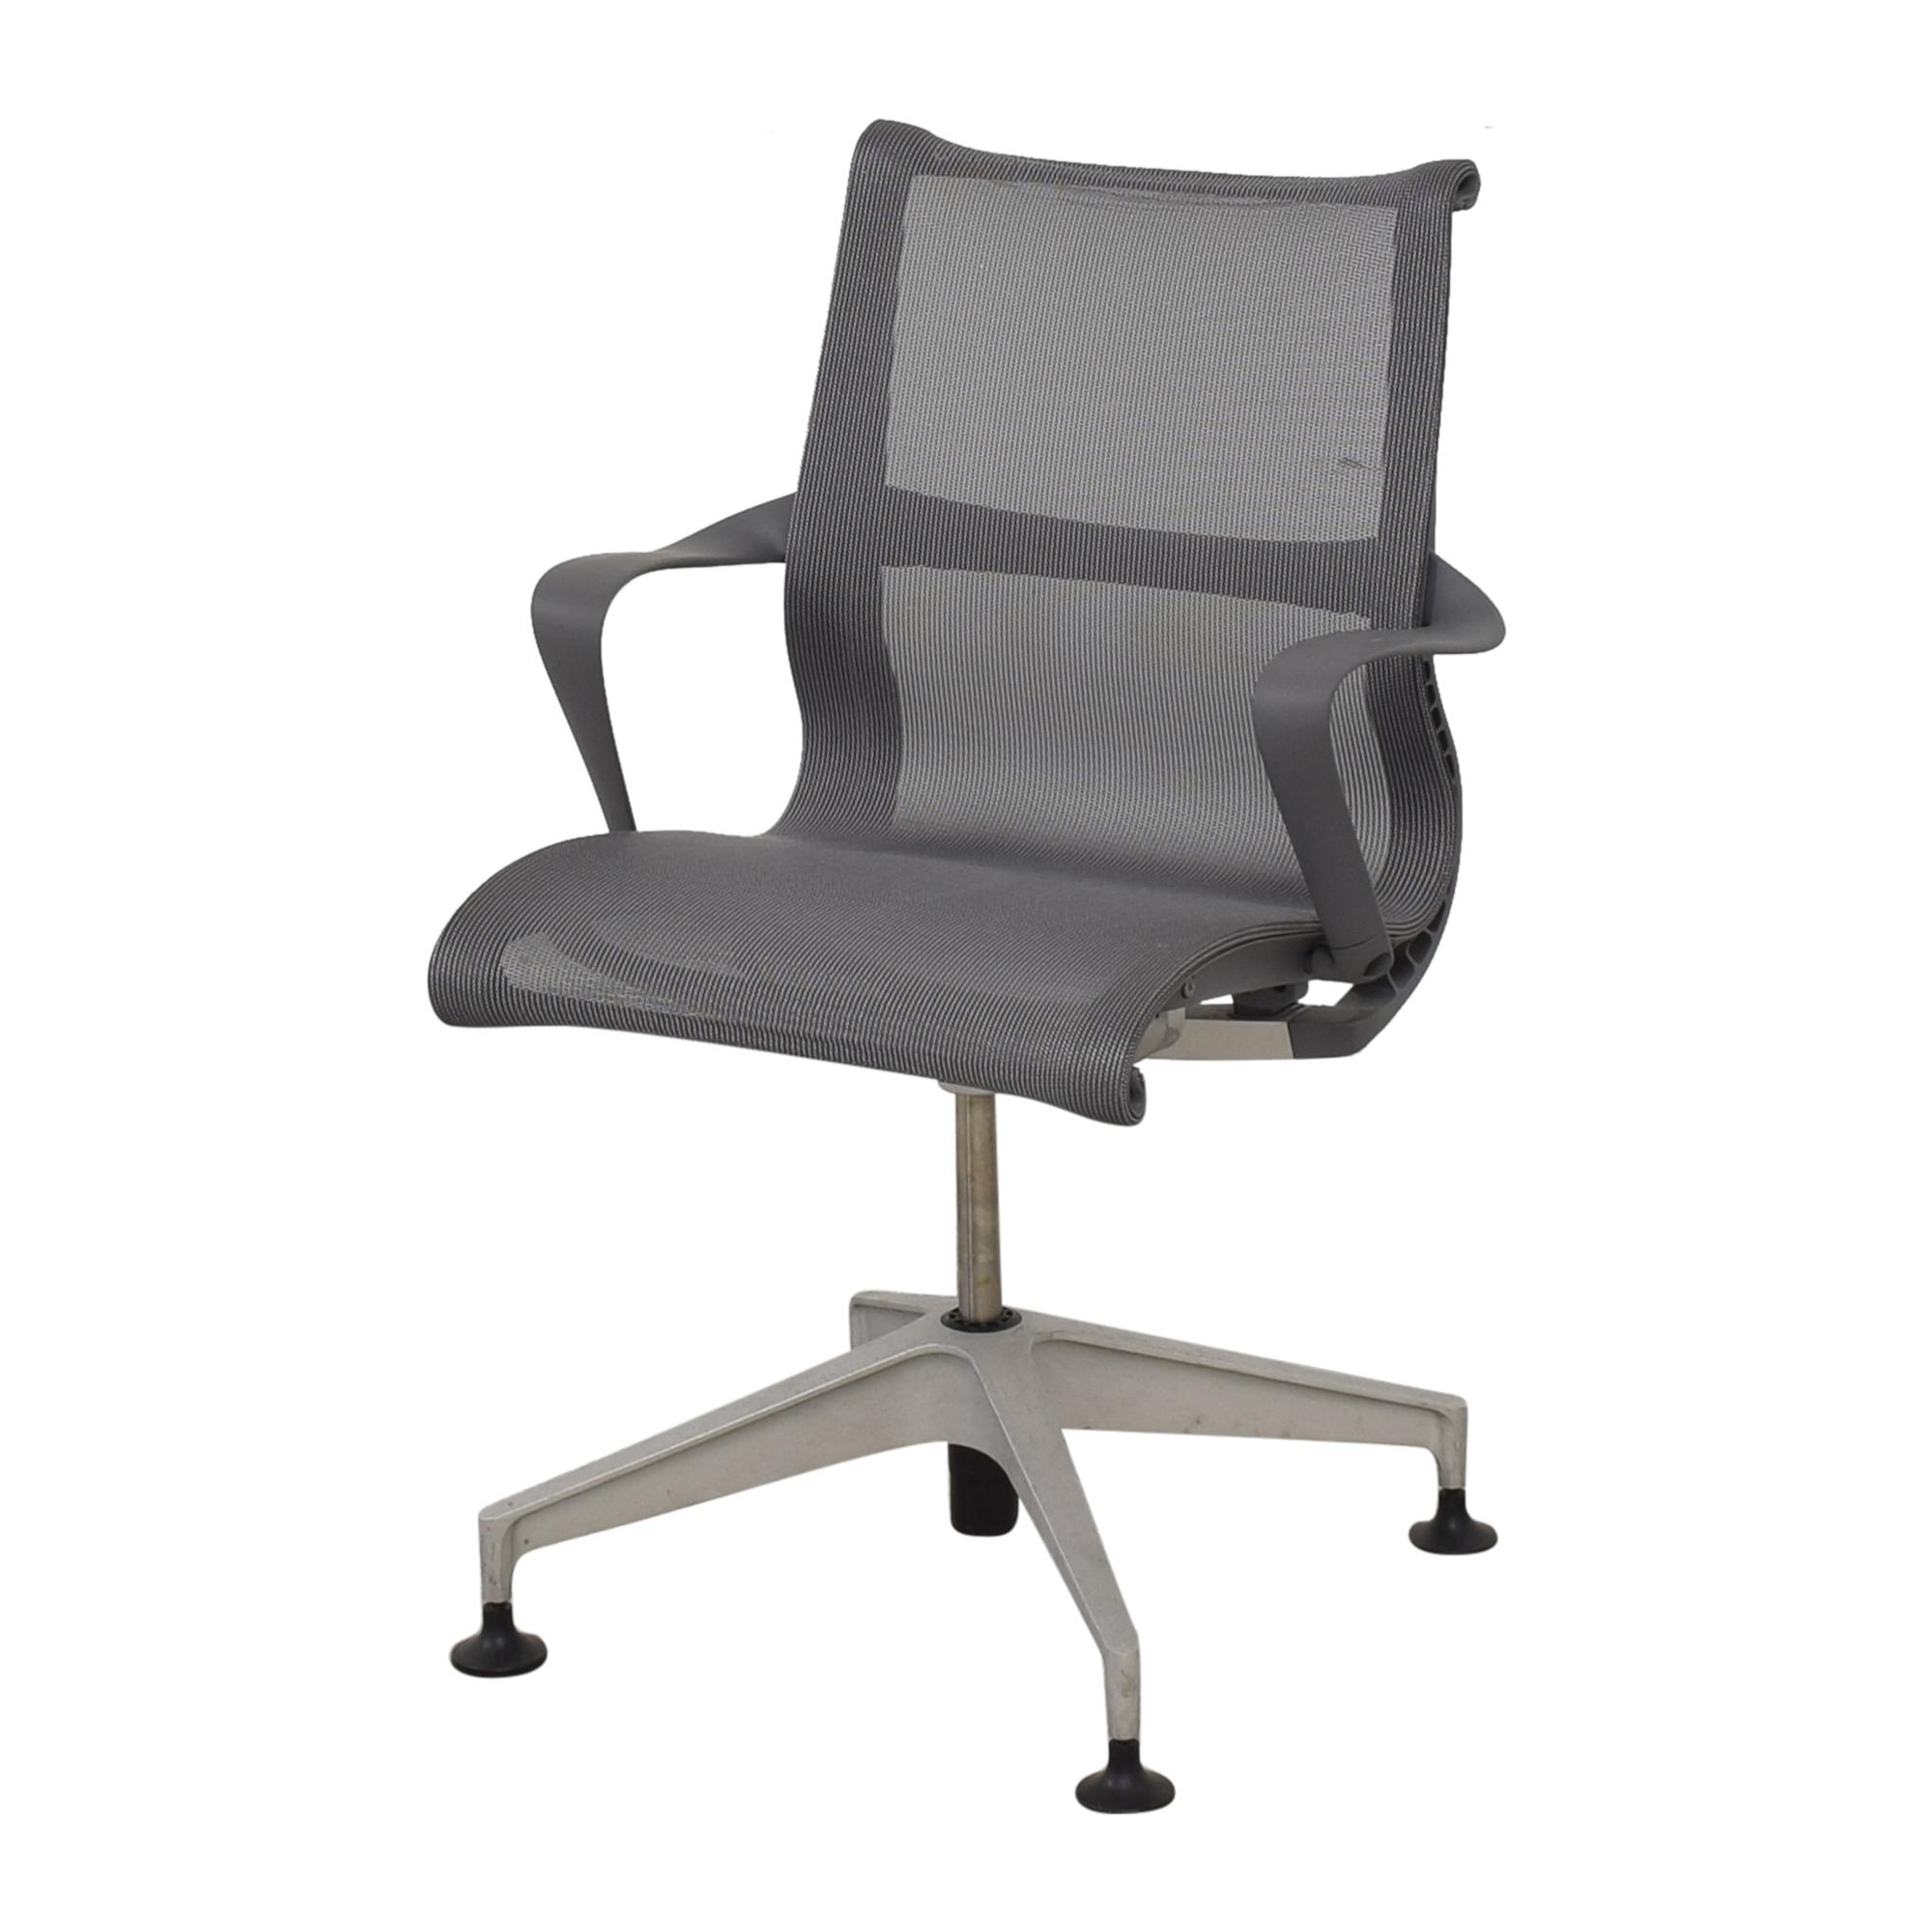 Herman Miller Setu Chair / Chairs